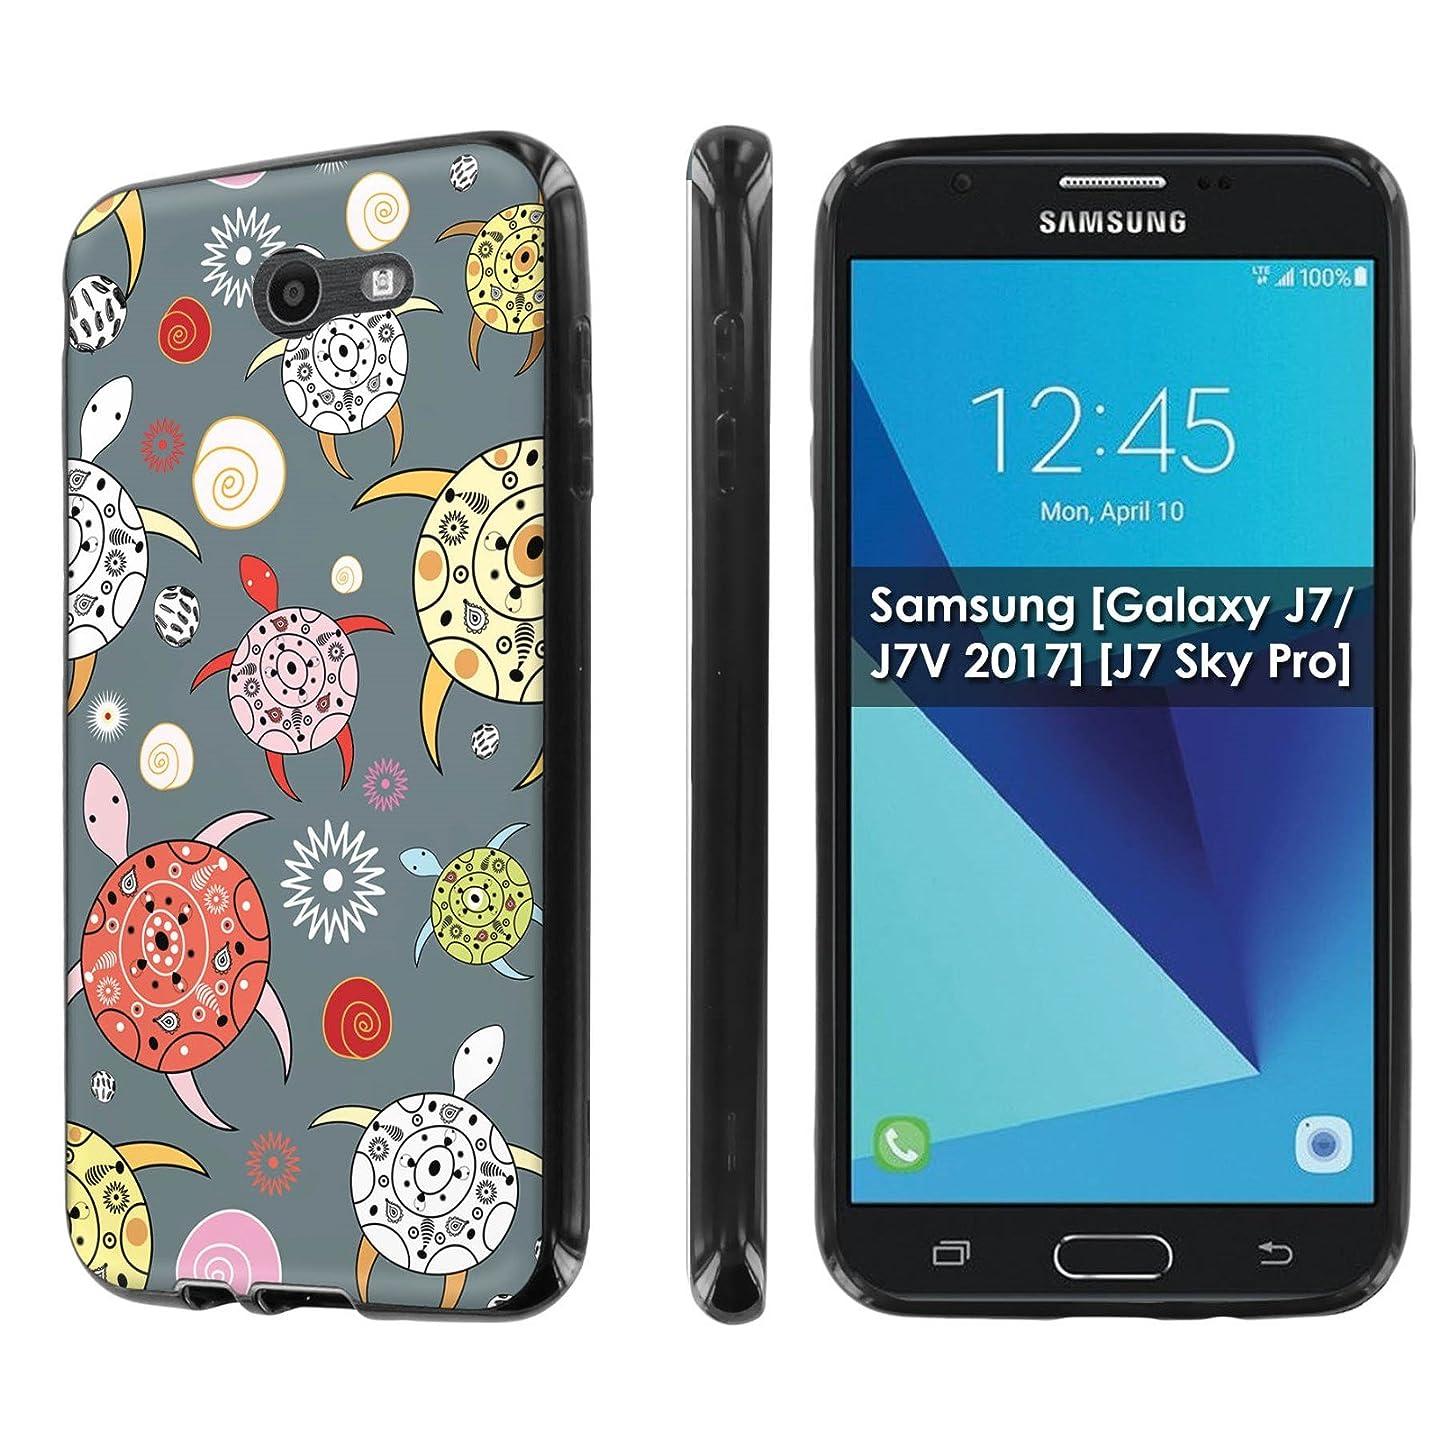 Samsung [Galaxy J7/J7V 2017] [J7 Sky Pro] [NakedShield] [Black] Ultra Slim Cover Case [Screen Protector] - [Pattern Sea Turtle] for Galaxy J7 [2017]